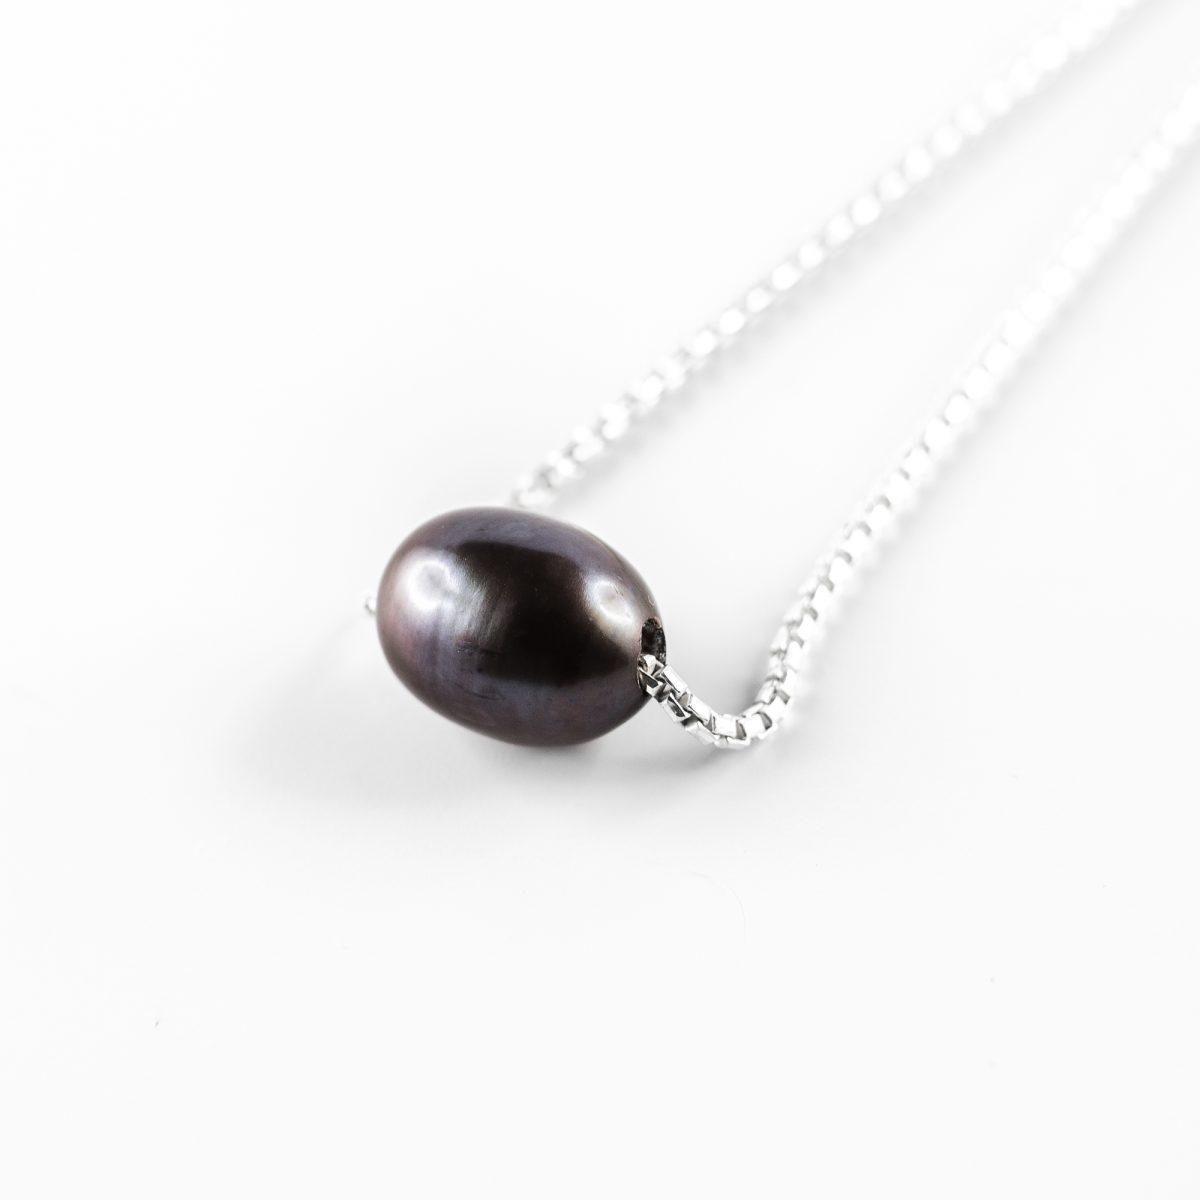 collier perle de culture noire perle de jade